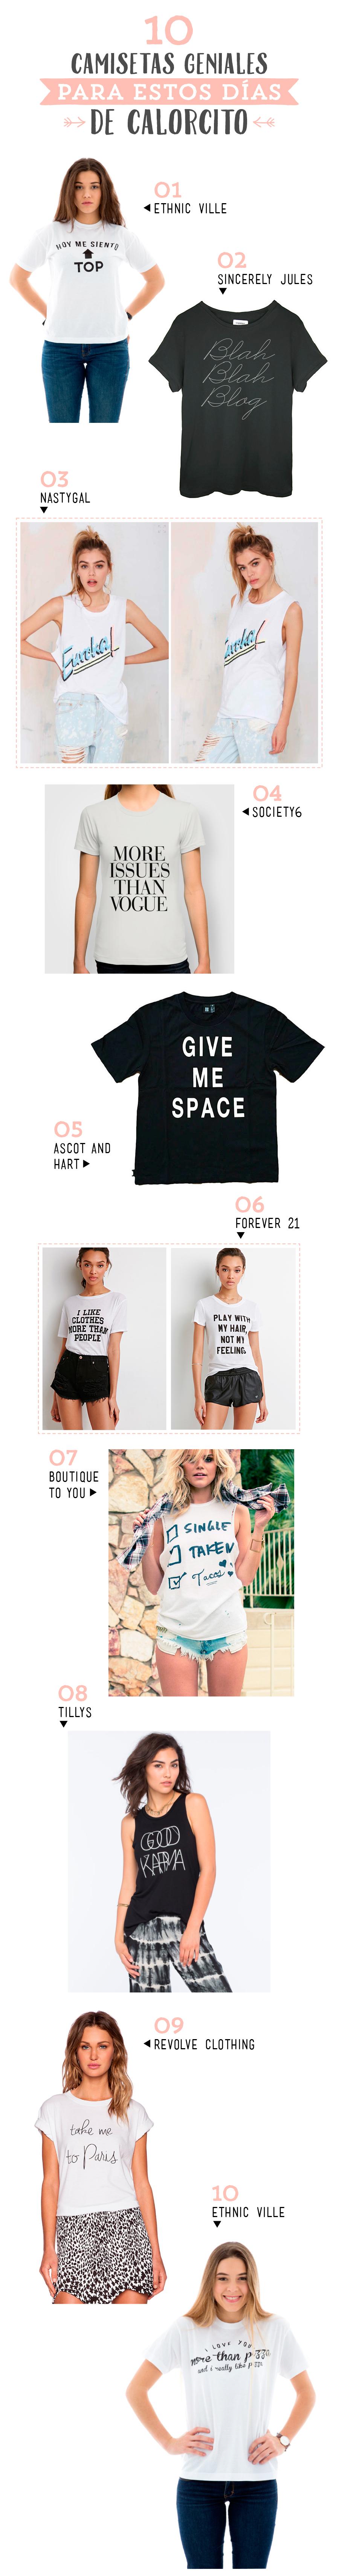 post_camisetas-para-el-calorcito